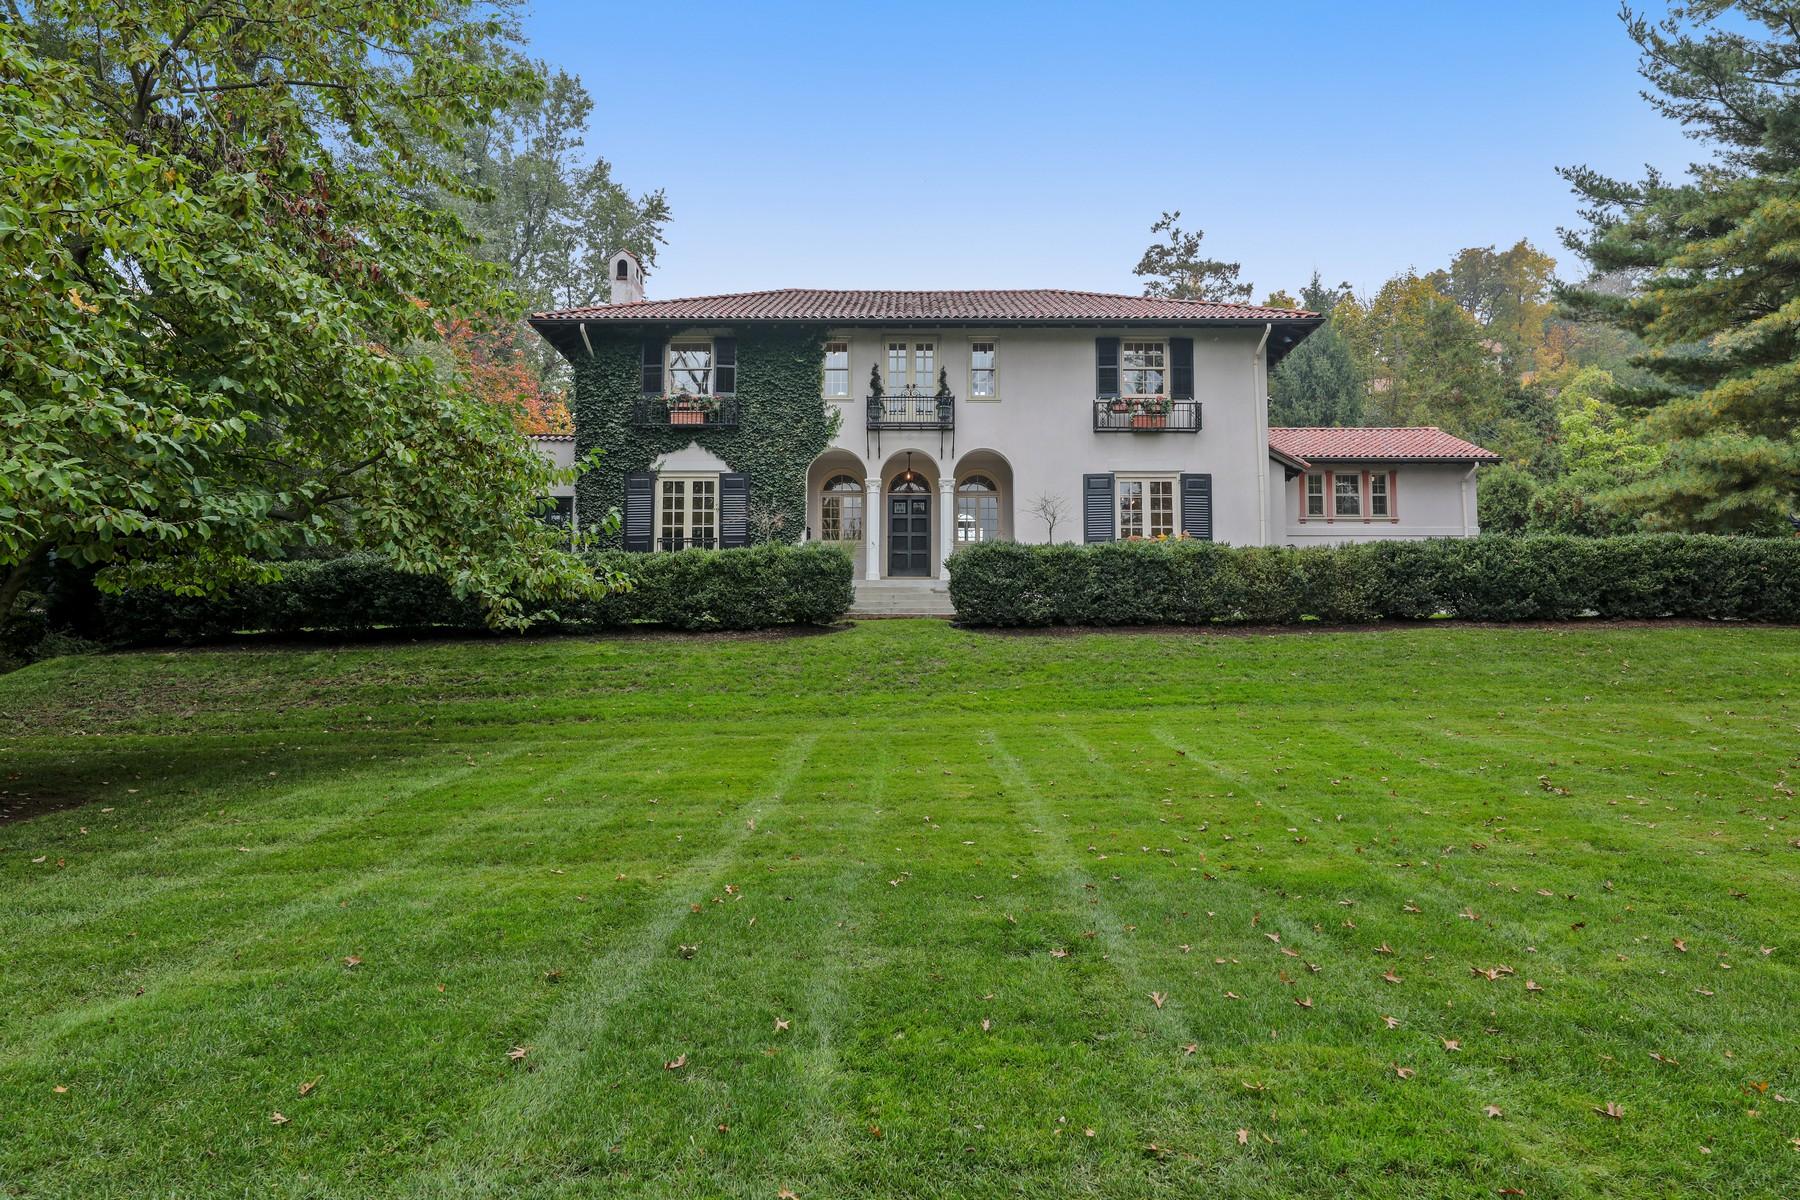 Single Family Homes для того Продажа на Perfect In Every Way! 46 Highland Ave, Montclair, Нью-Джерси 07042 Соединенные Штаты